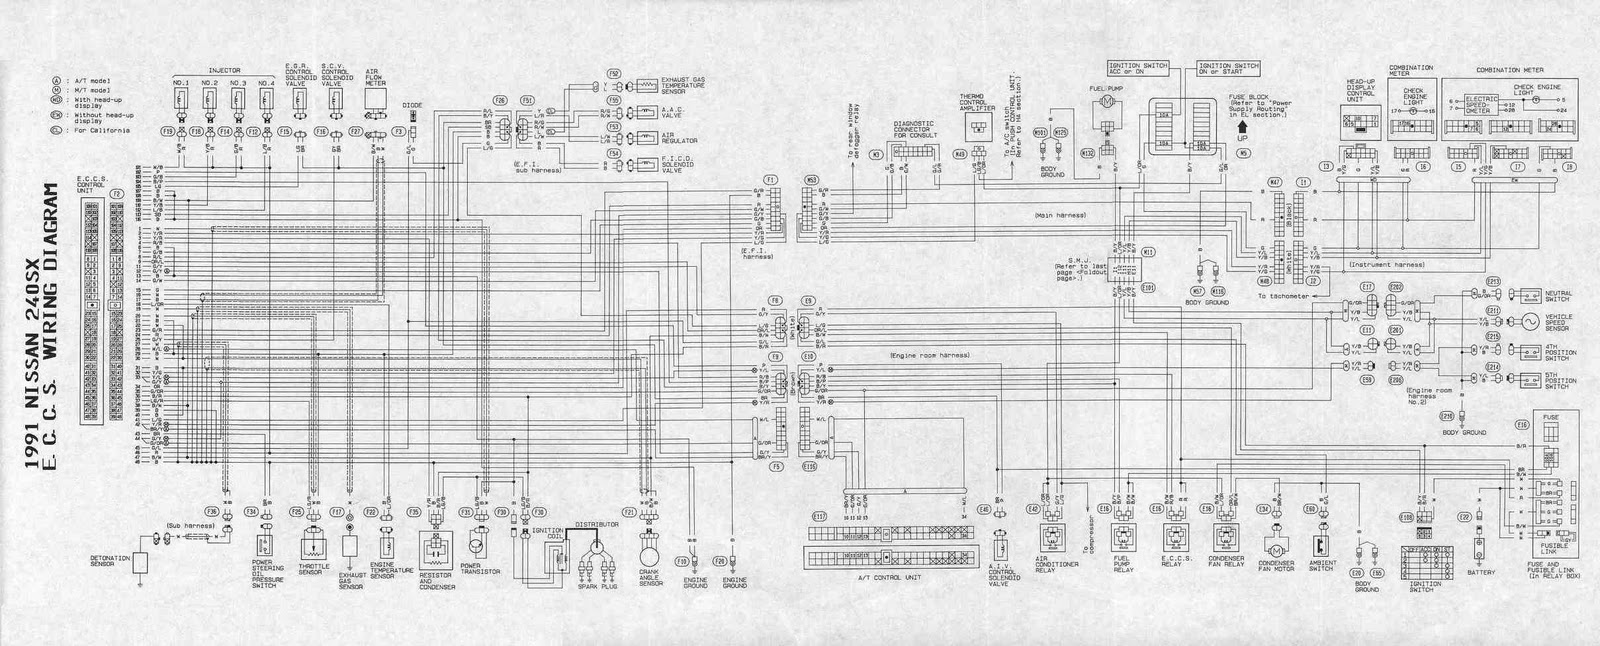 Awesome Epiphone G10 Single Humbucker Wiring Diagram Model - Simple ...